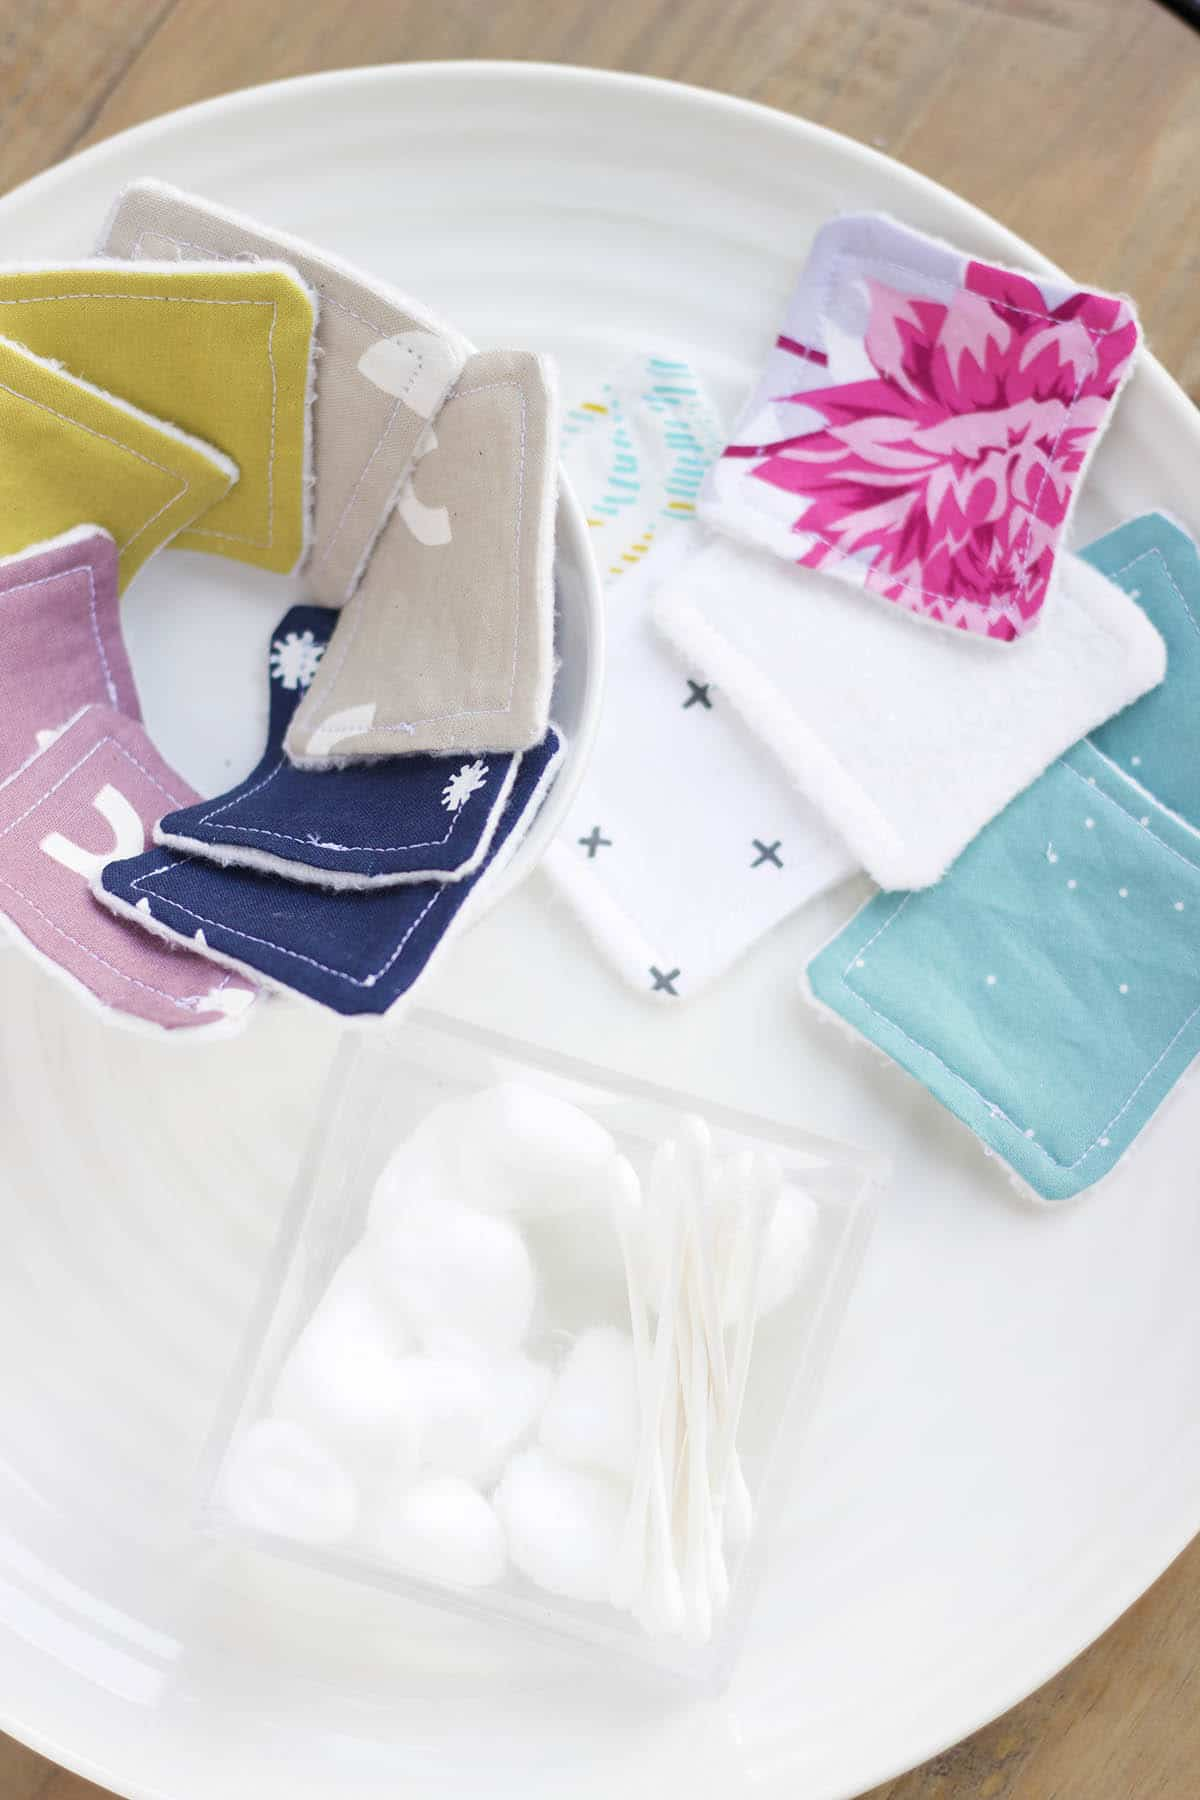 Kakaru Designs makeup removal pads